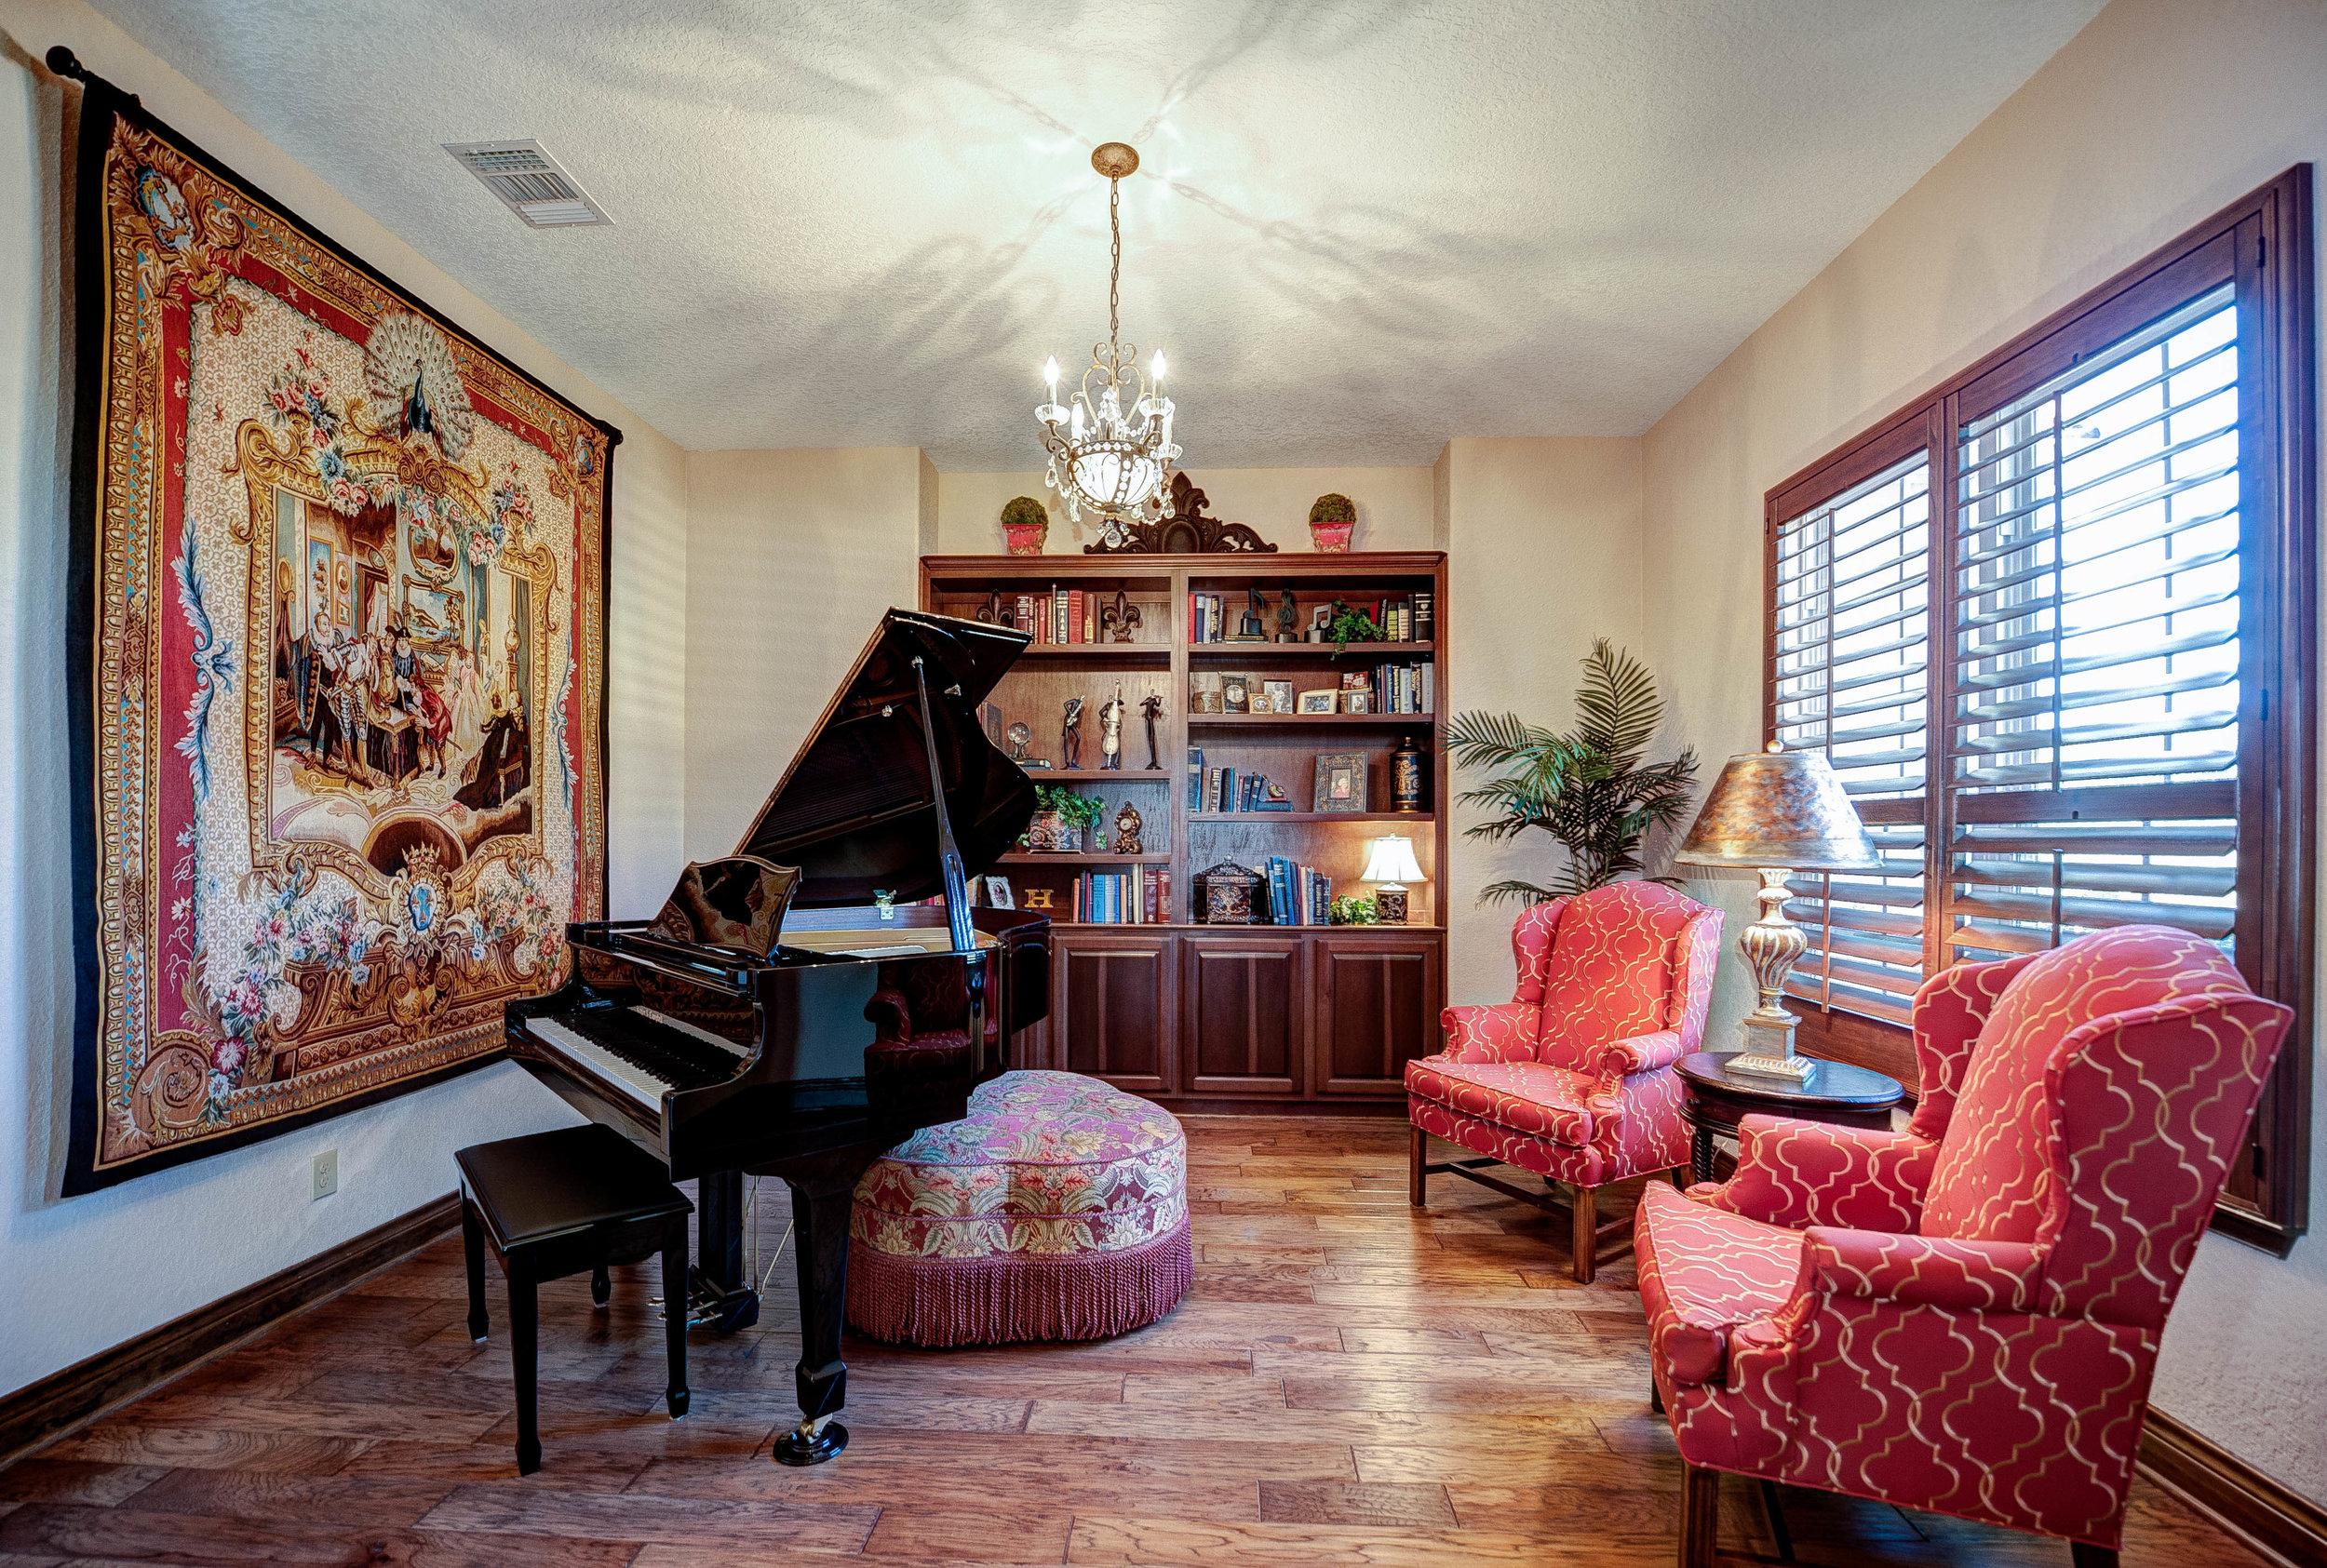 Texas Elegance - VIEW MORE >>